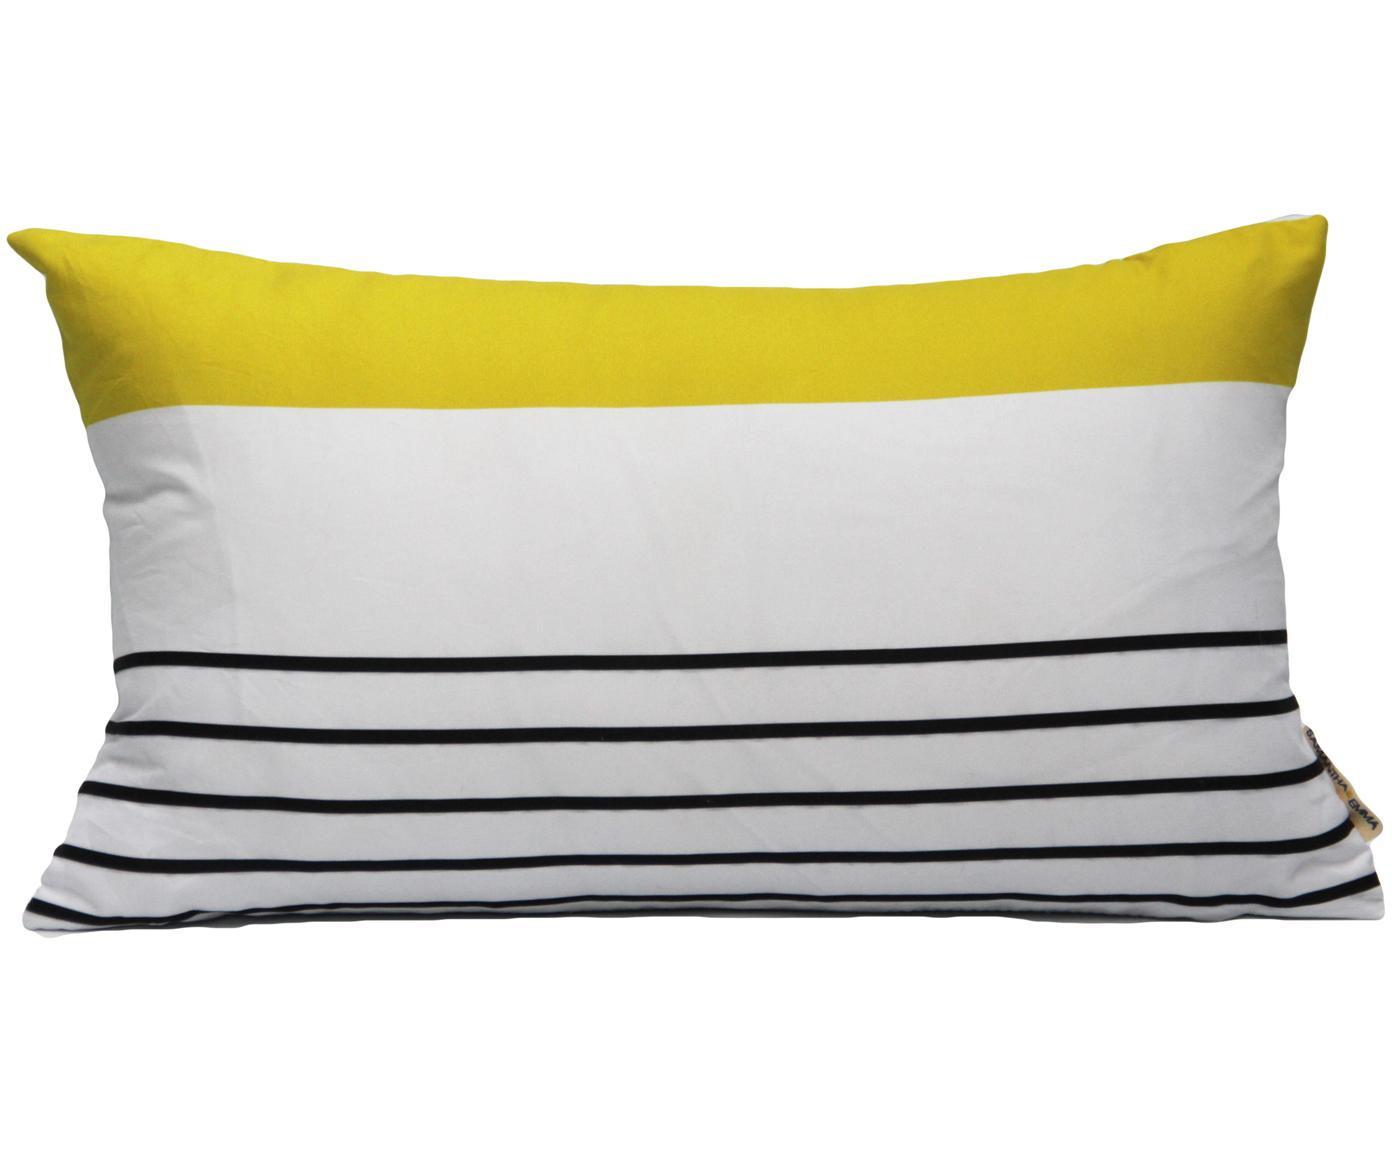 Funda de cojín Magdalena, Poliéster, Blanco, amarillo, negro, An 30 x L 50 cm